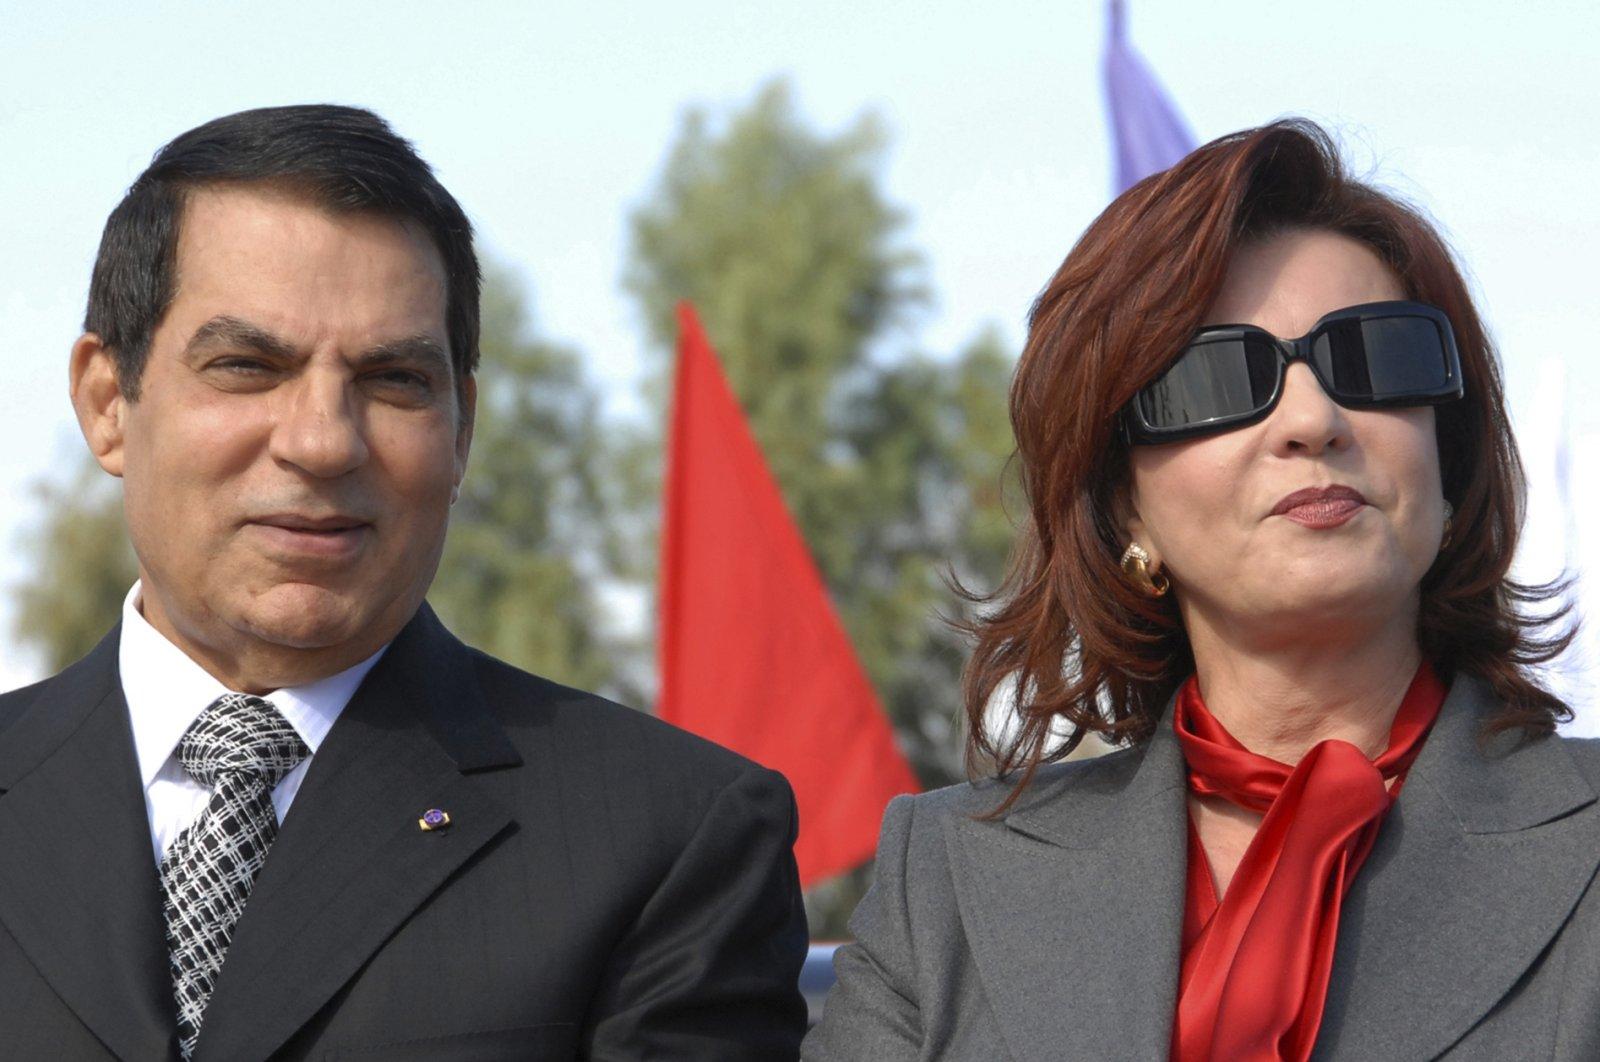 In this file photo, Tunisian President Zine EL Abidine Ben Ali and his wife, Leila, mark the 20th anniversary of Ben Ali's presidency, in Rades, outside Tunis, Nov. 7, 2007. (AP Photo)